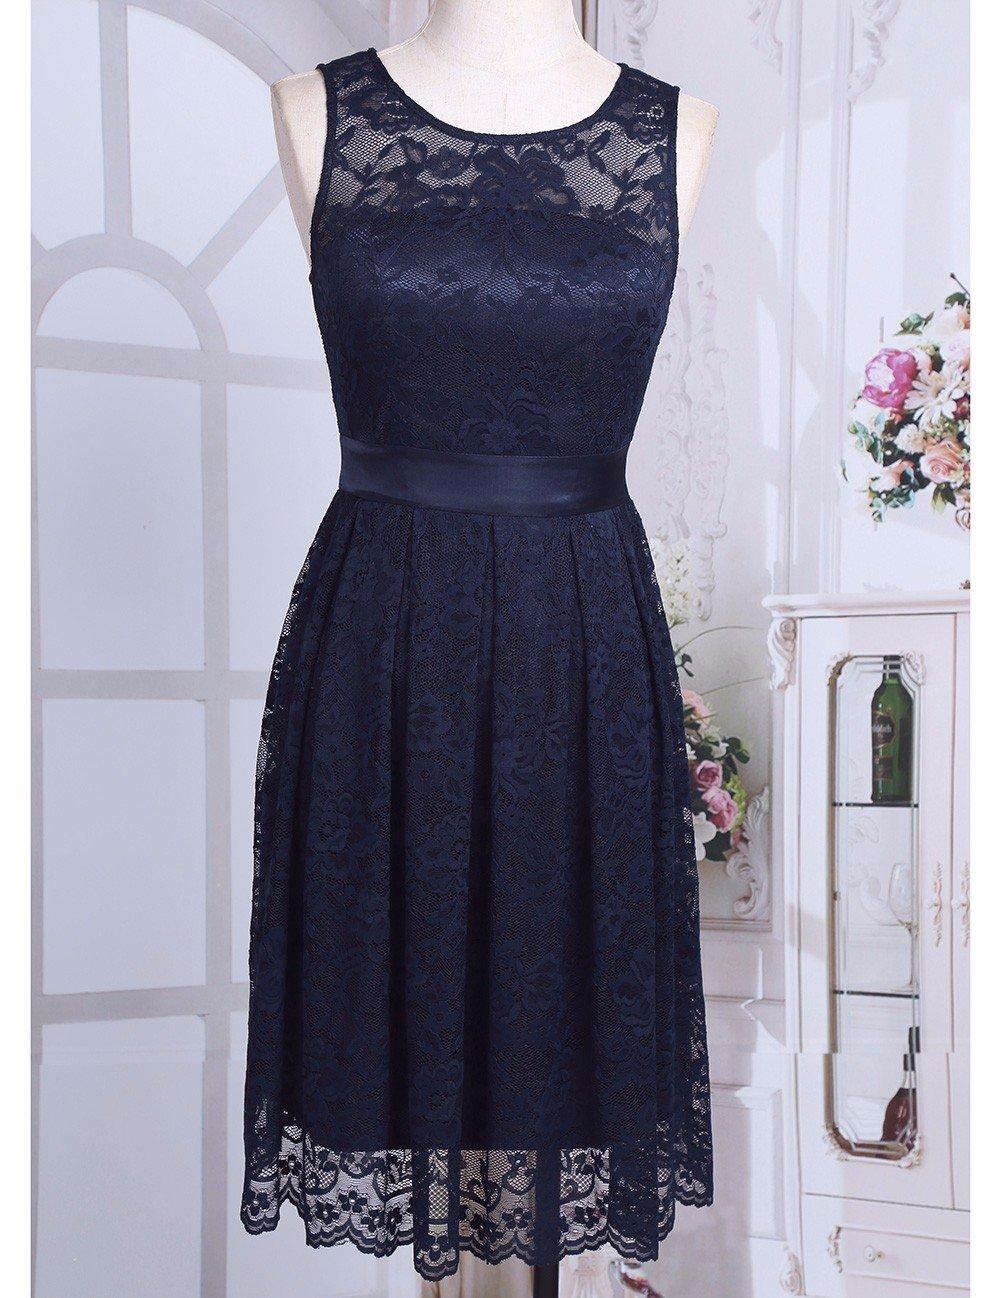 iiniim Womens Vintage Floral Lace Sleeveless Evening Dress